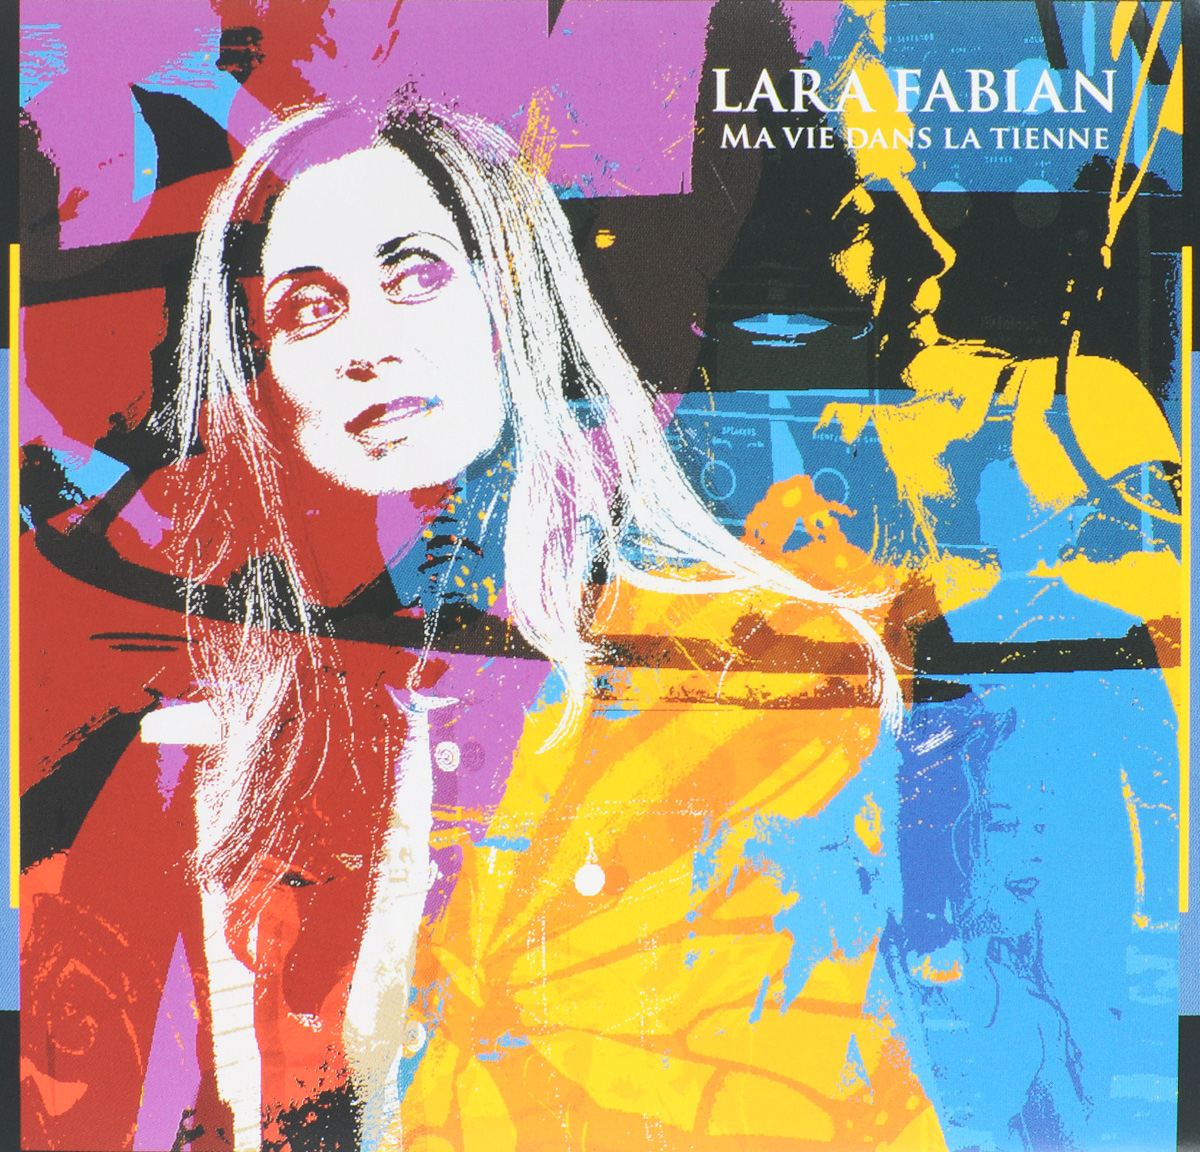 Лара Фабиан Lara Fabian. Ma Vie Dans La Tienne. Edition Limitee (CD + DVD) чайник lara lr00 04 r